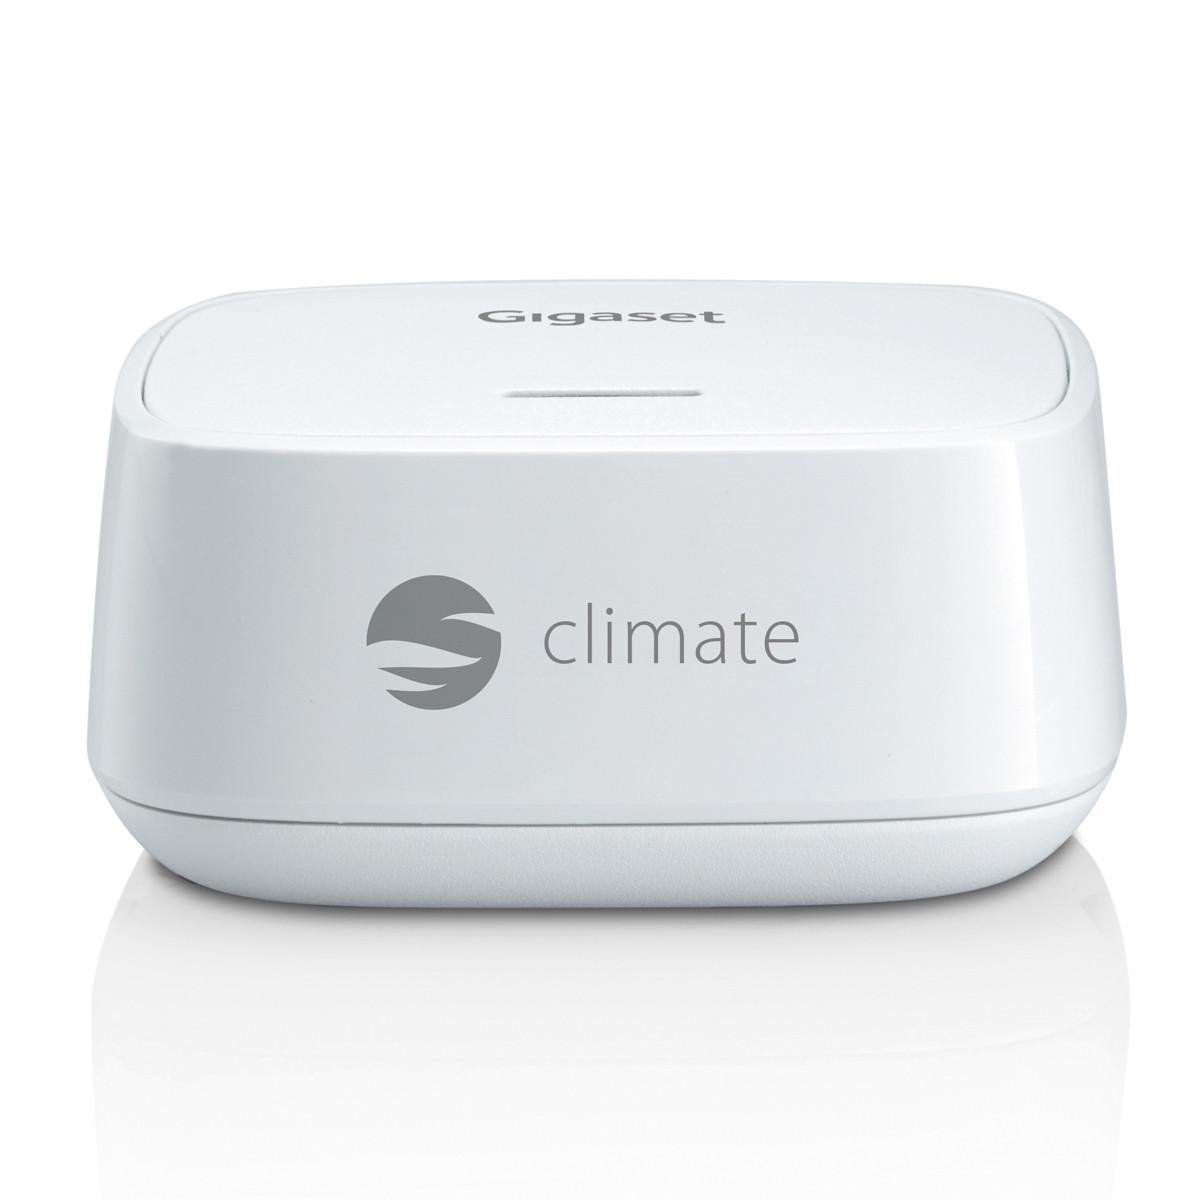 Gigaset Climate Sensor ONE X